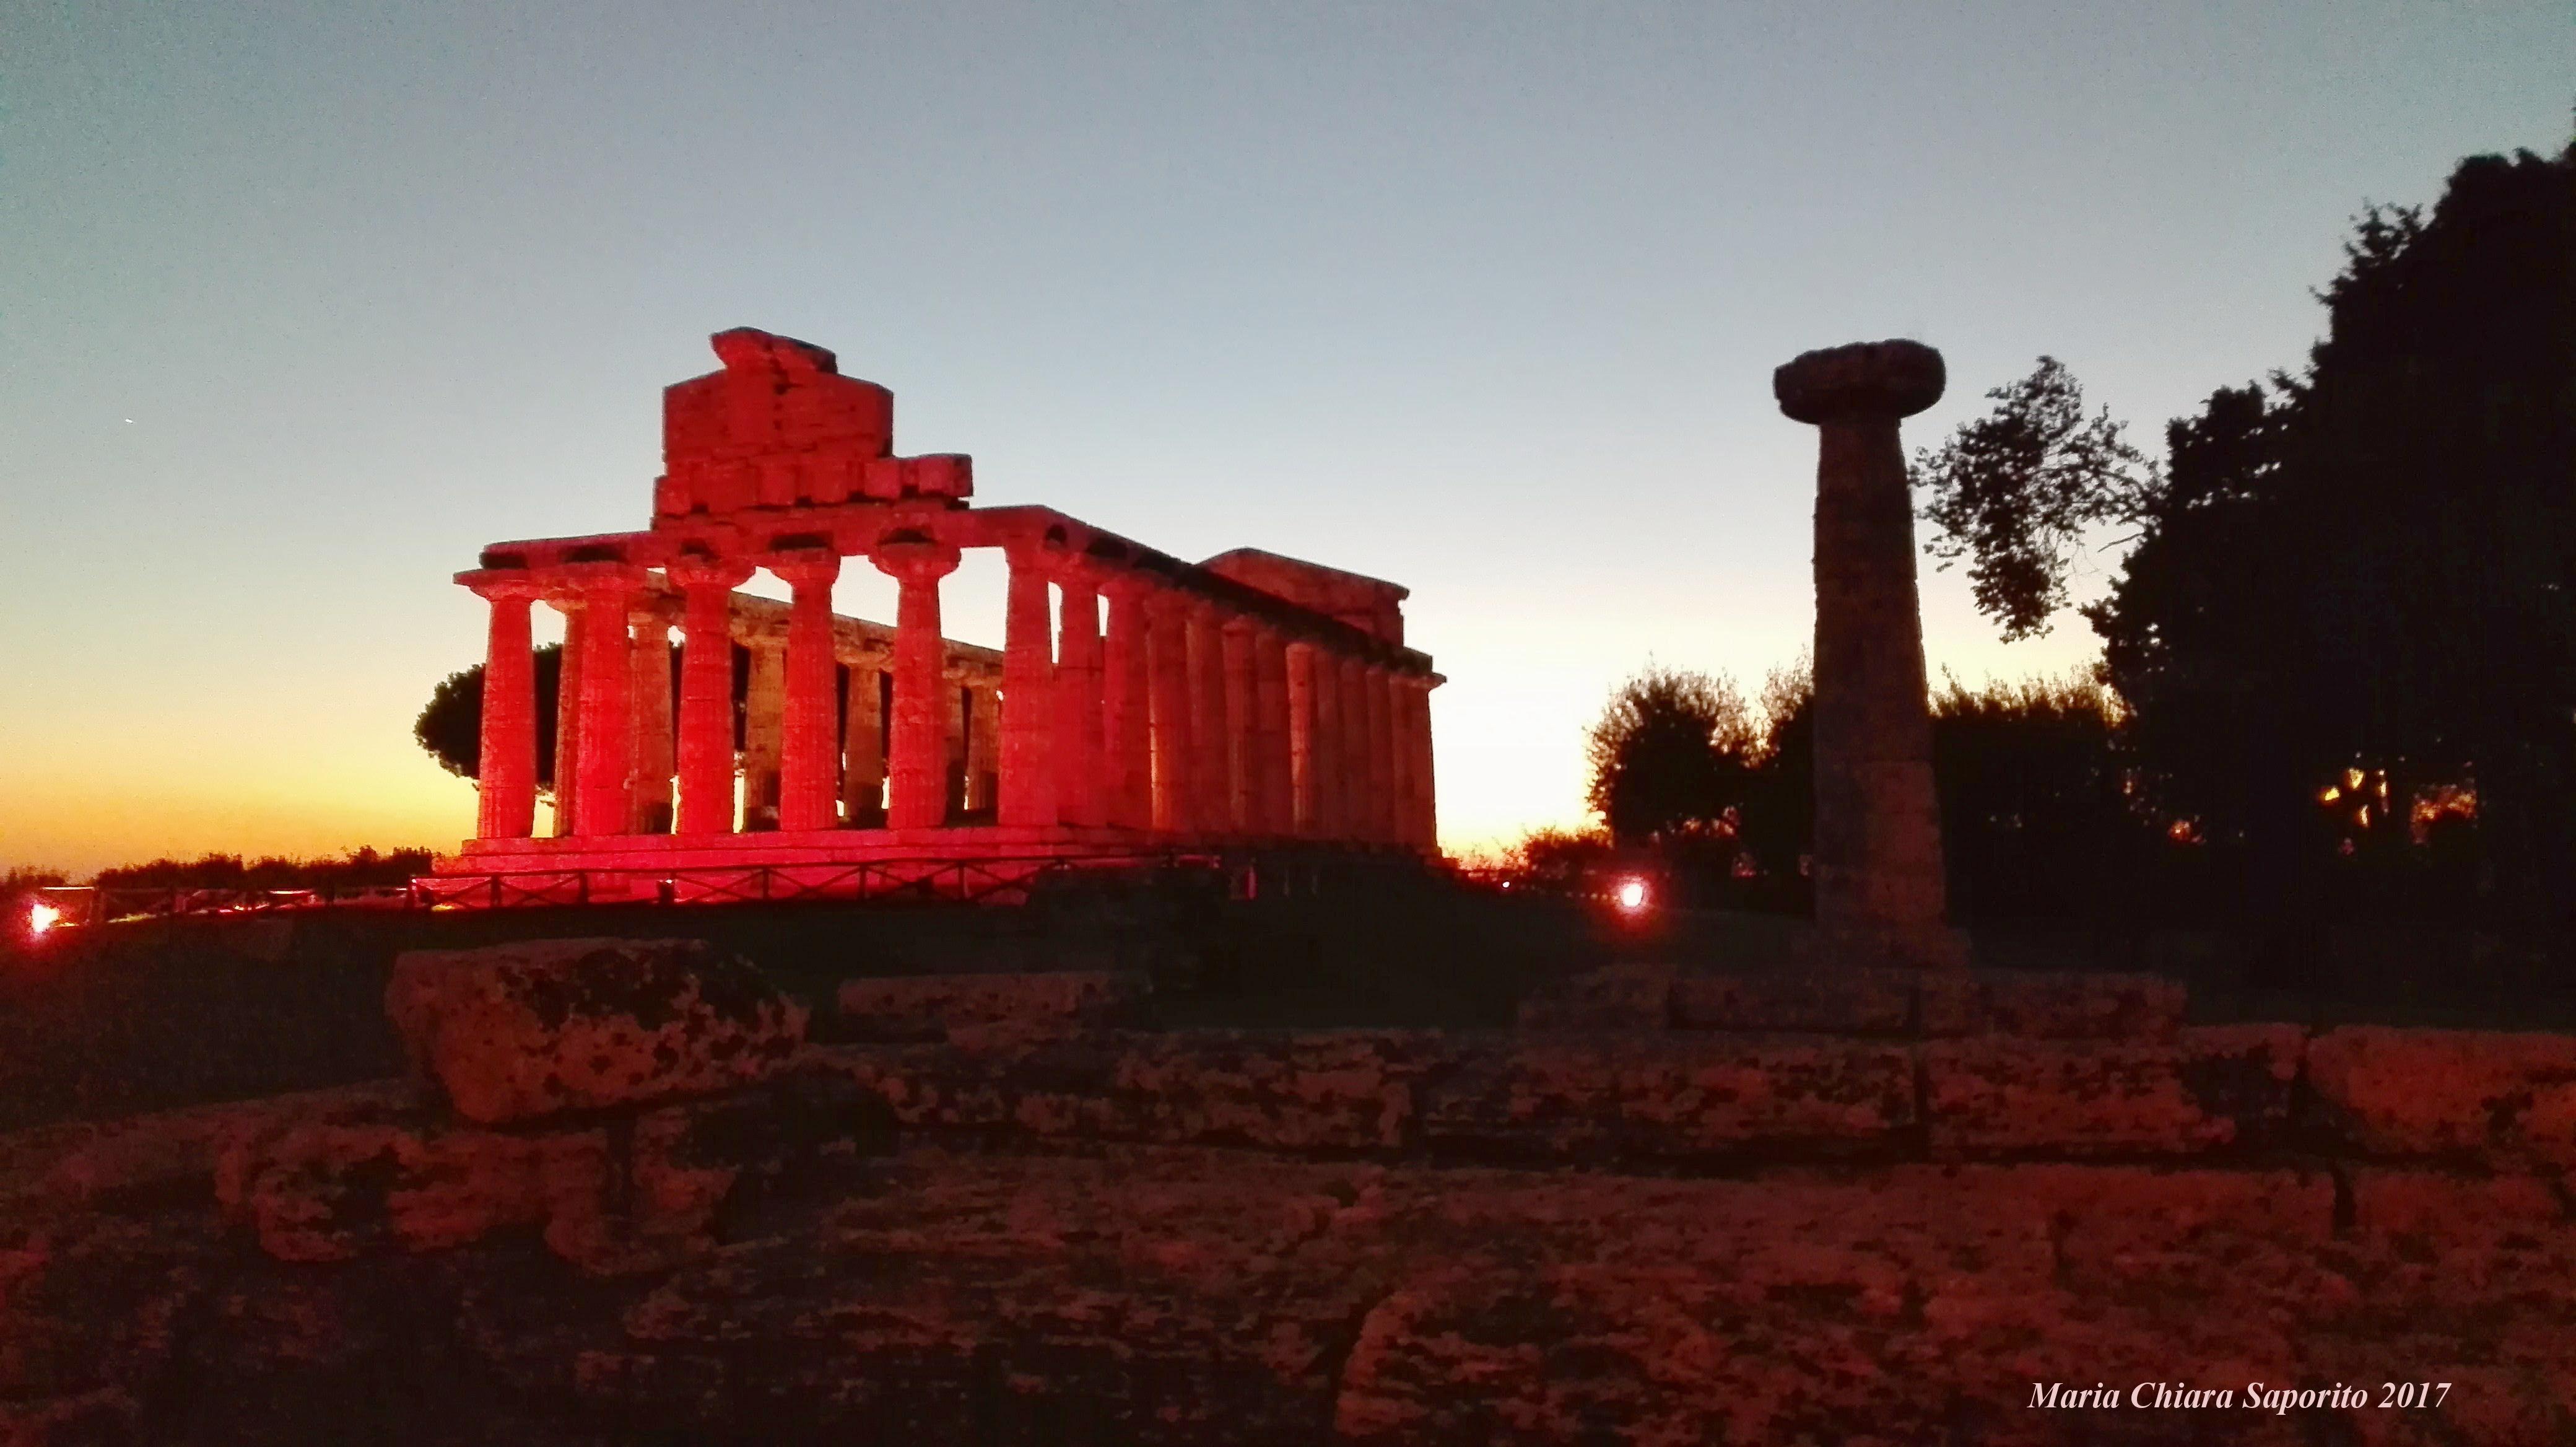 Parco Archeologico di Paestum, tramonto sui Templi